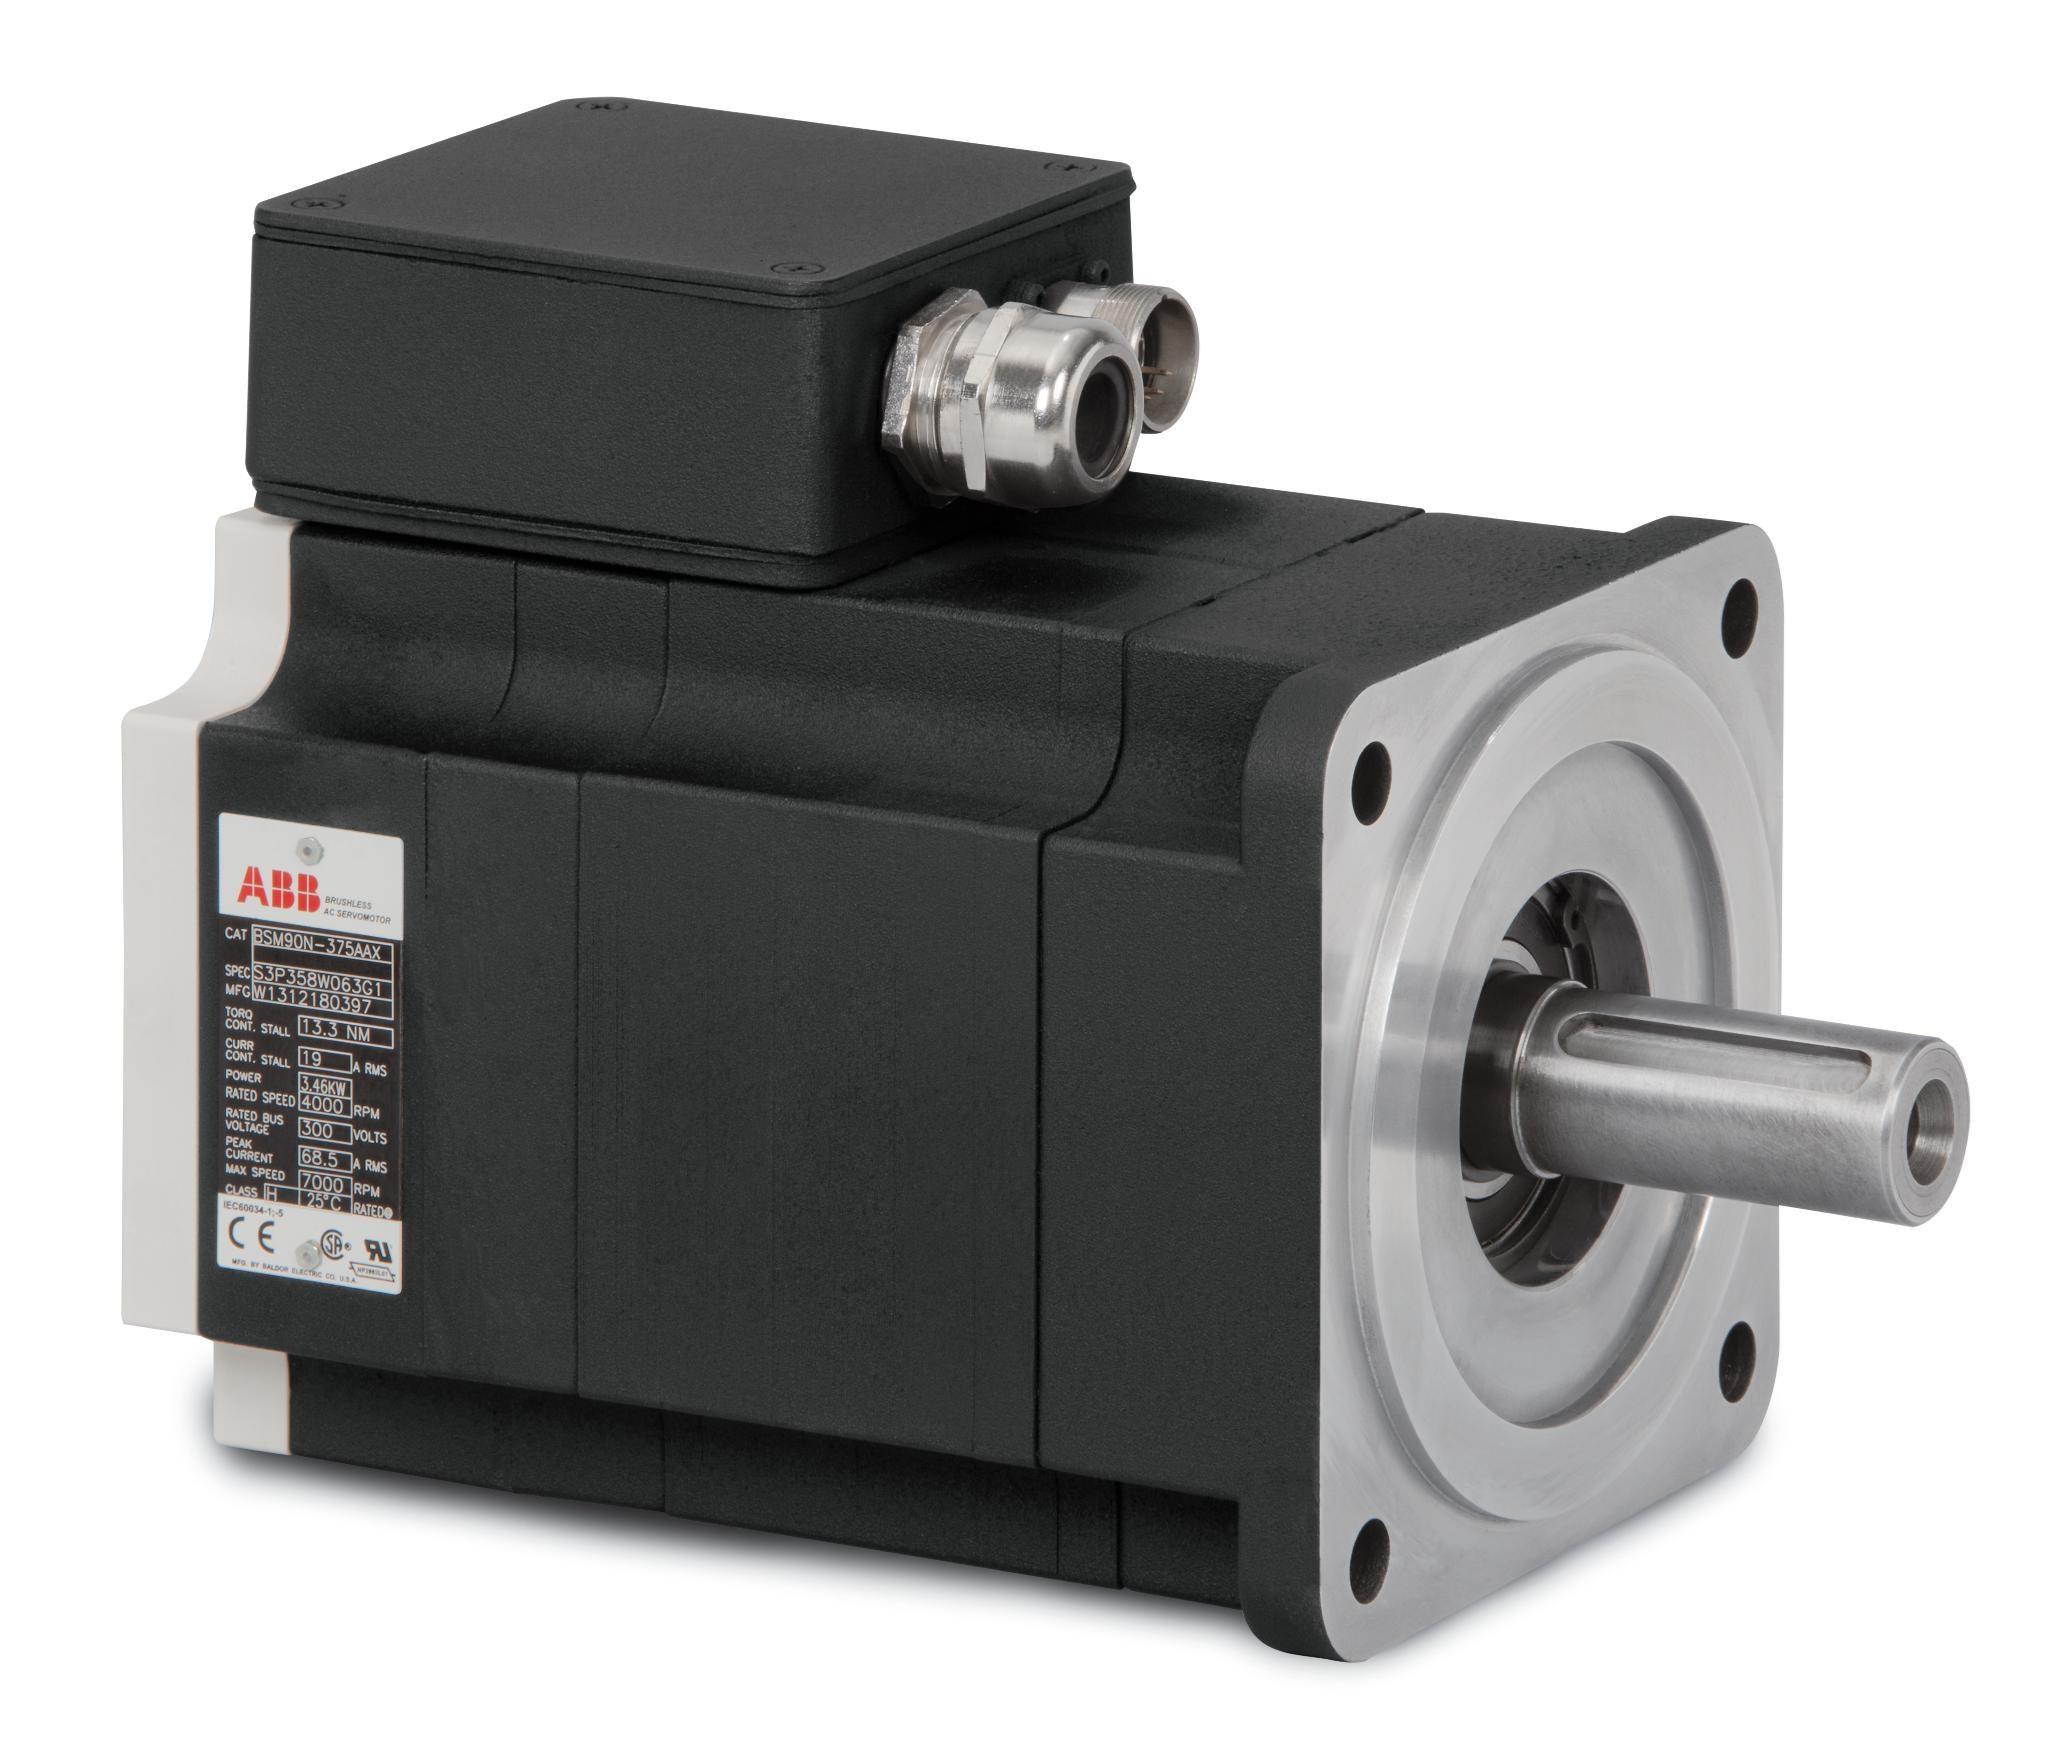 Baldor Servo Wiring Diagram For Professional Ac Motor Brushless C Series Motors Com Rh Single Phase